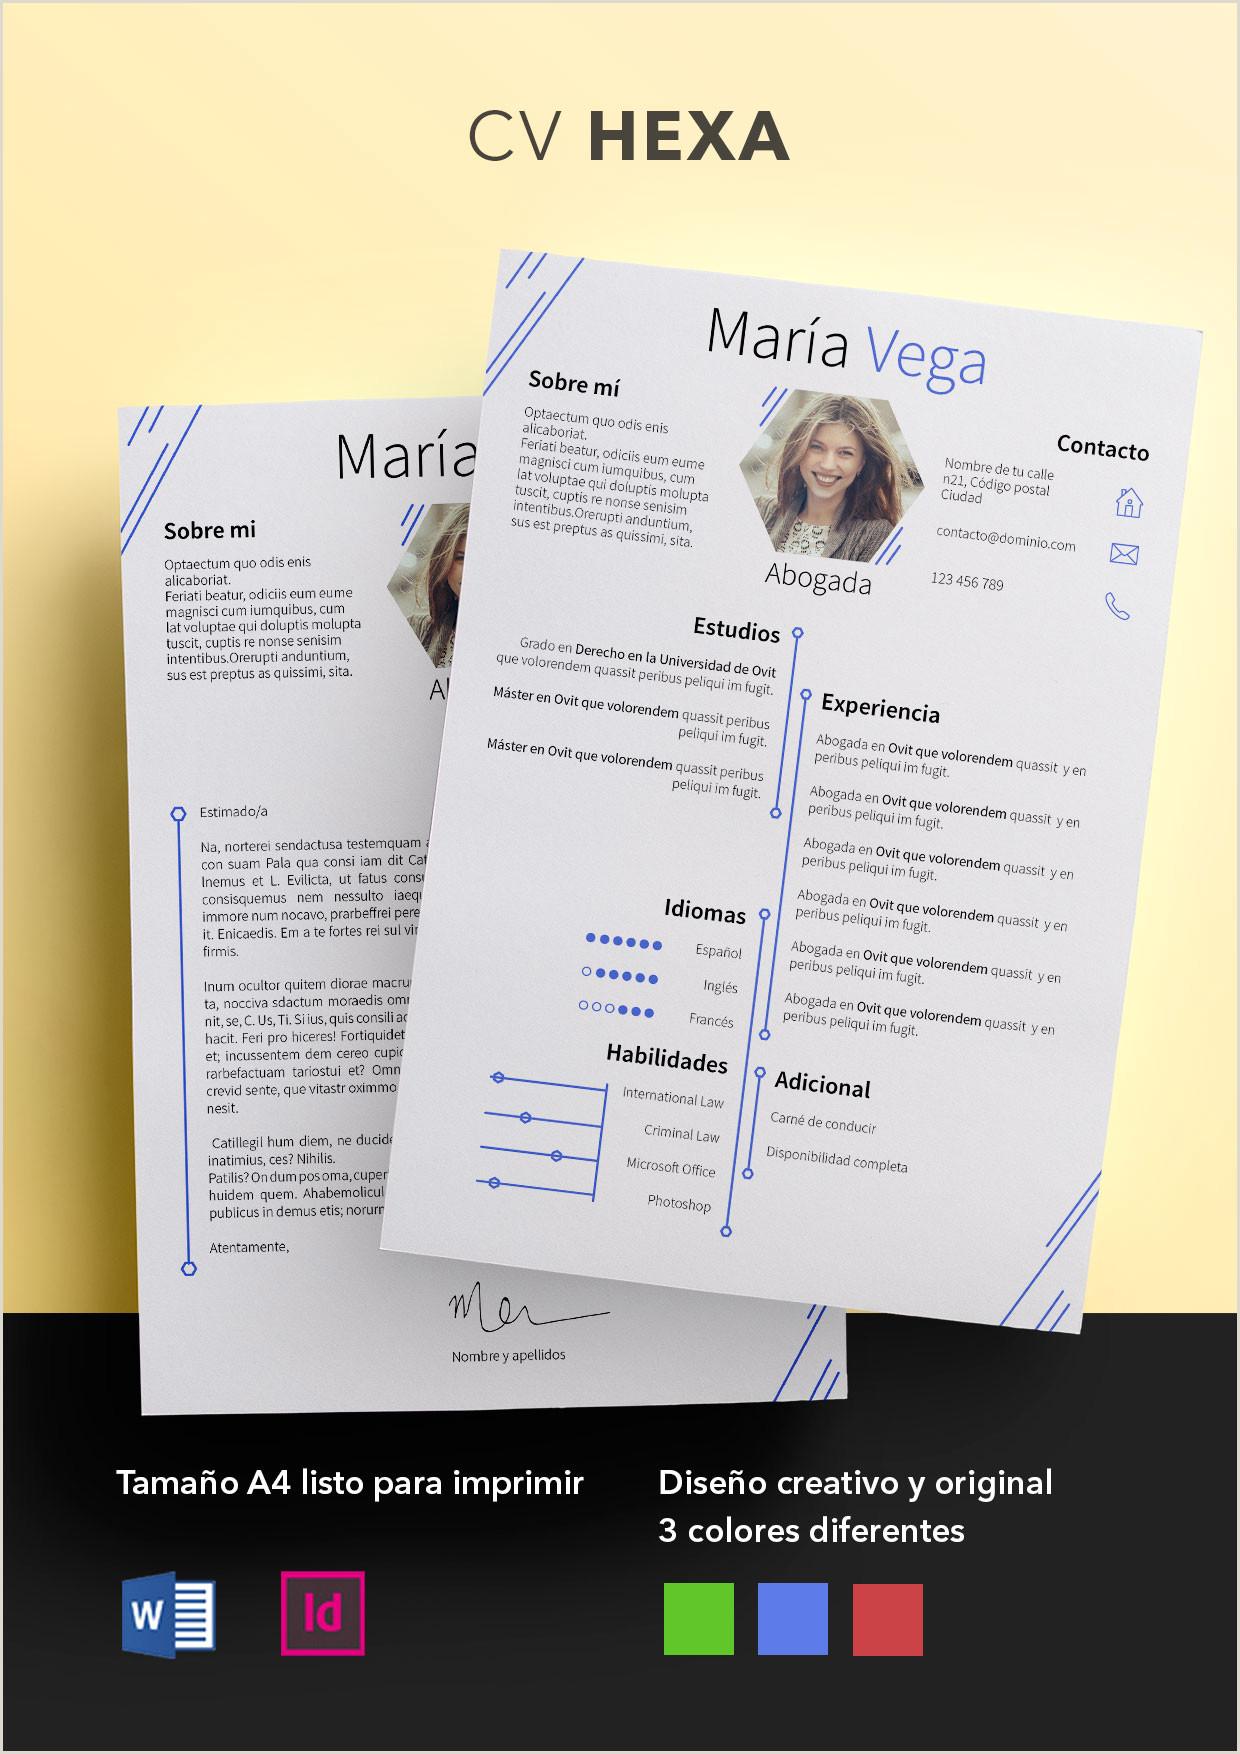 Plantilla Para Rellenar Un Curriculum Vitae Gratis Tienda Shop Cv La Tienda Del Curriculum Vitae